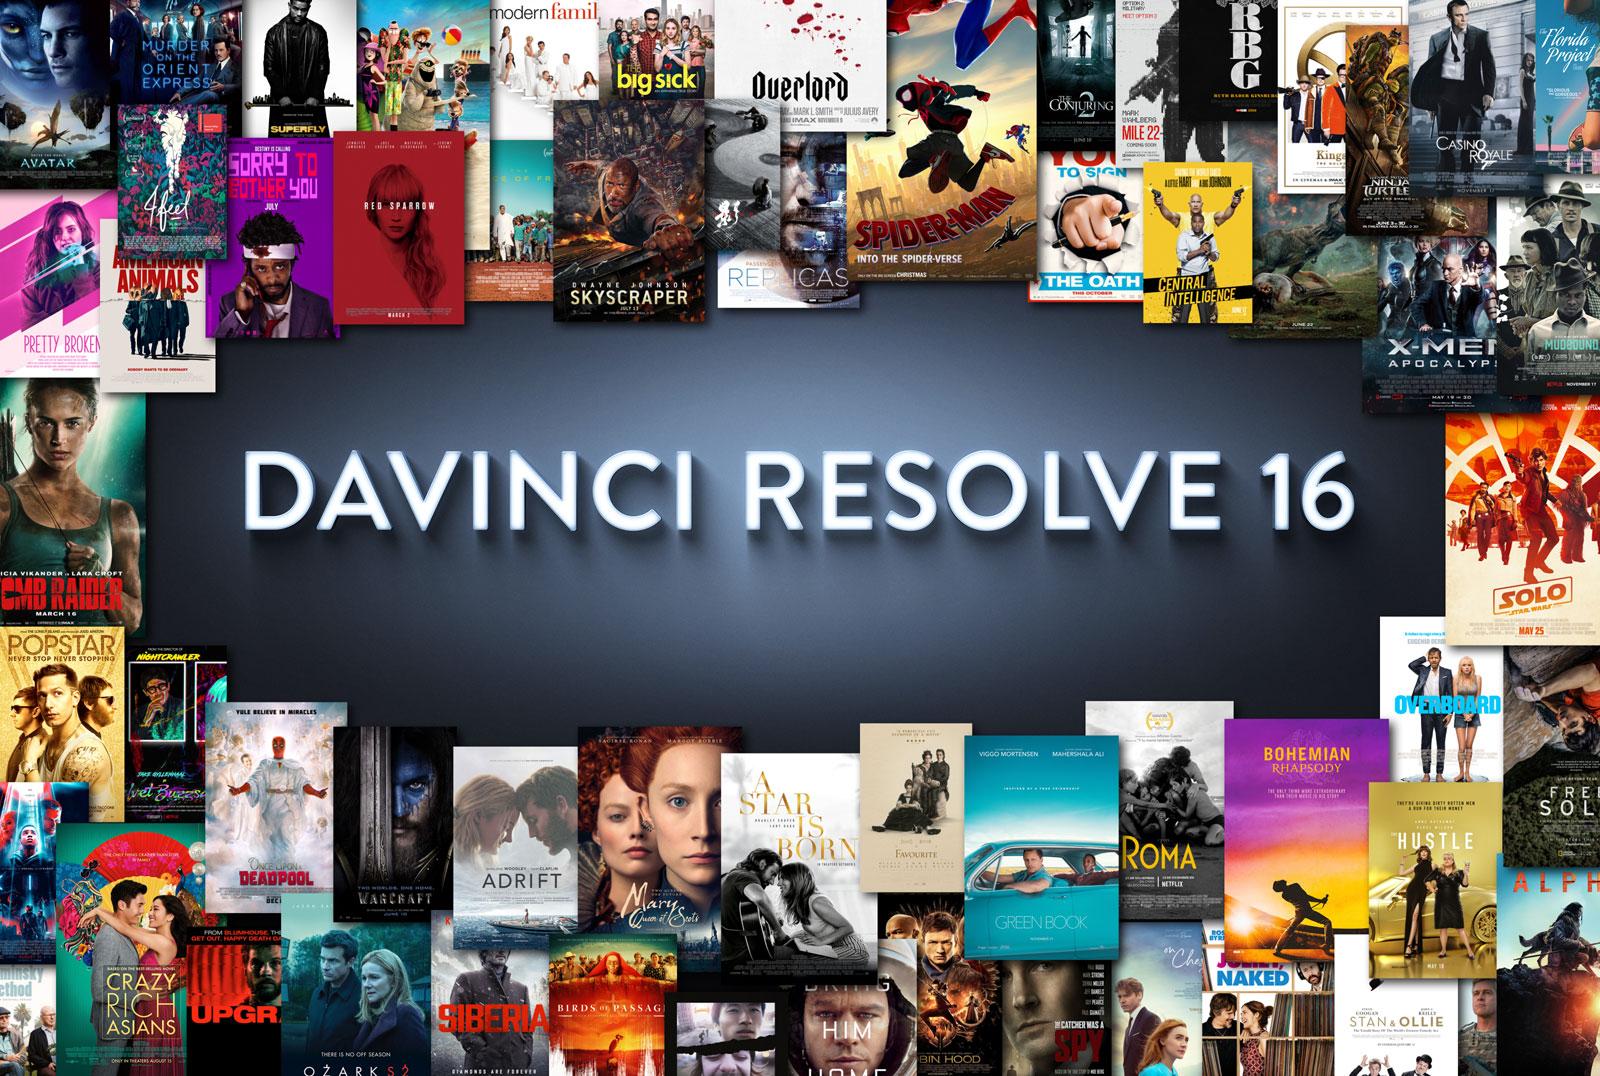 【A94】达芬奇调色软件DaVinci Resolve Studio 16.0b1 Mac 中文/英文破解版